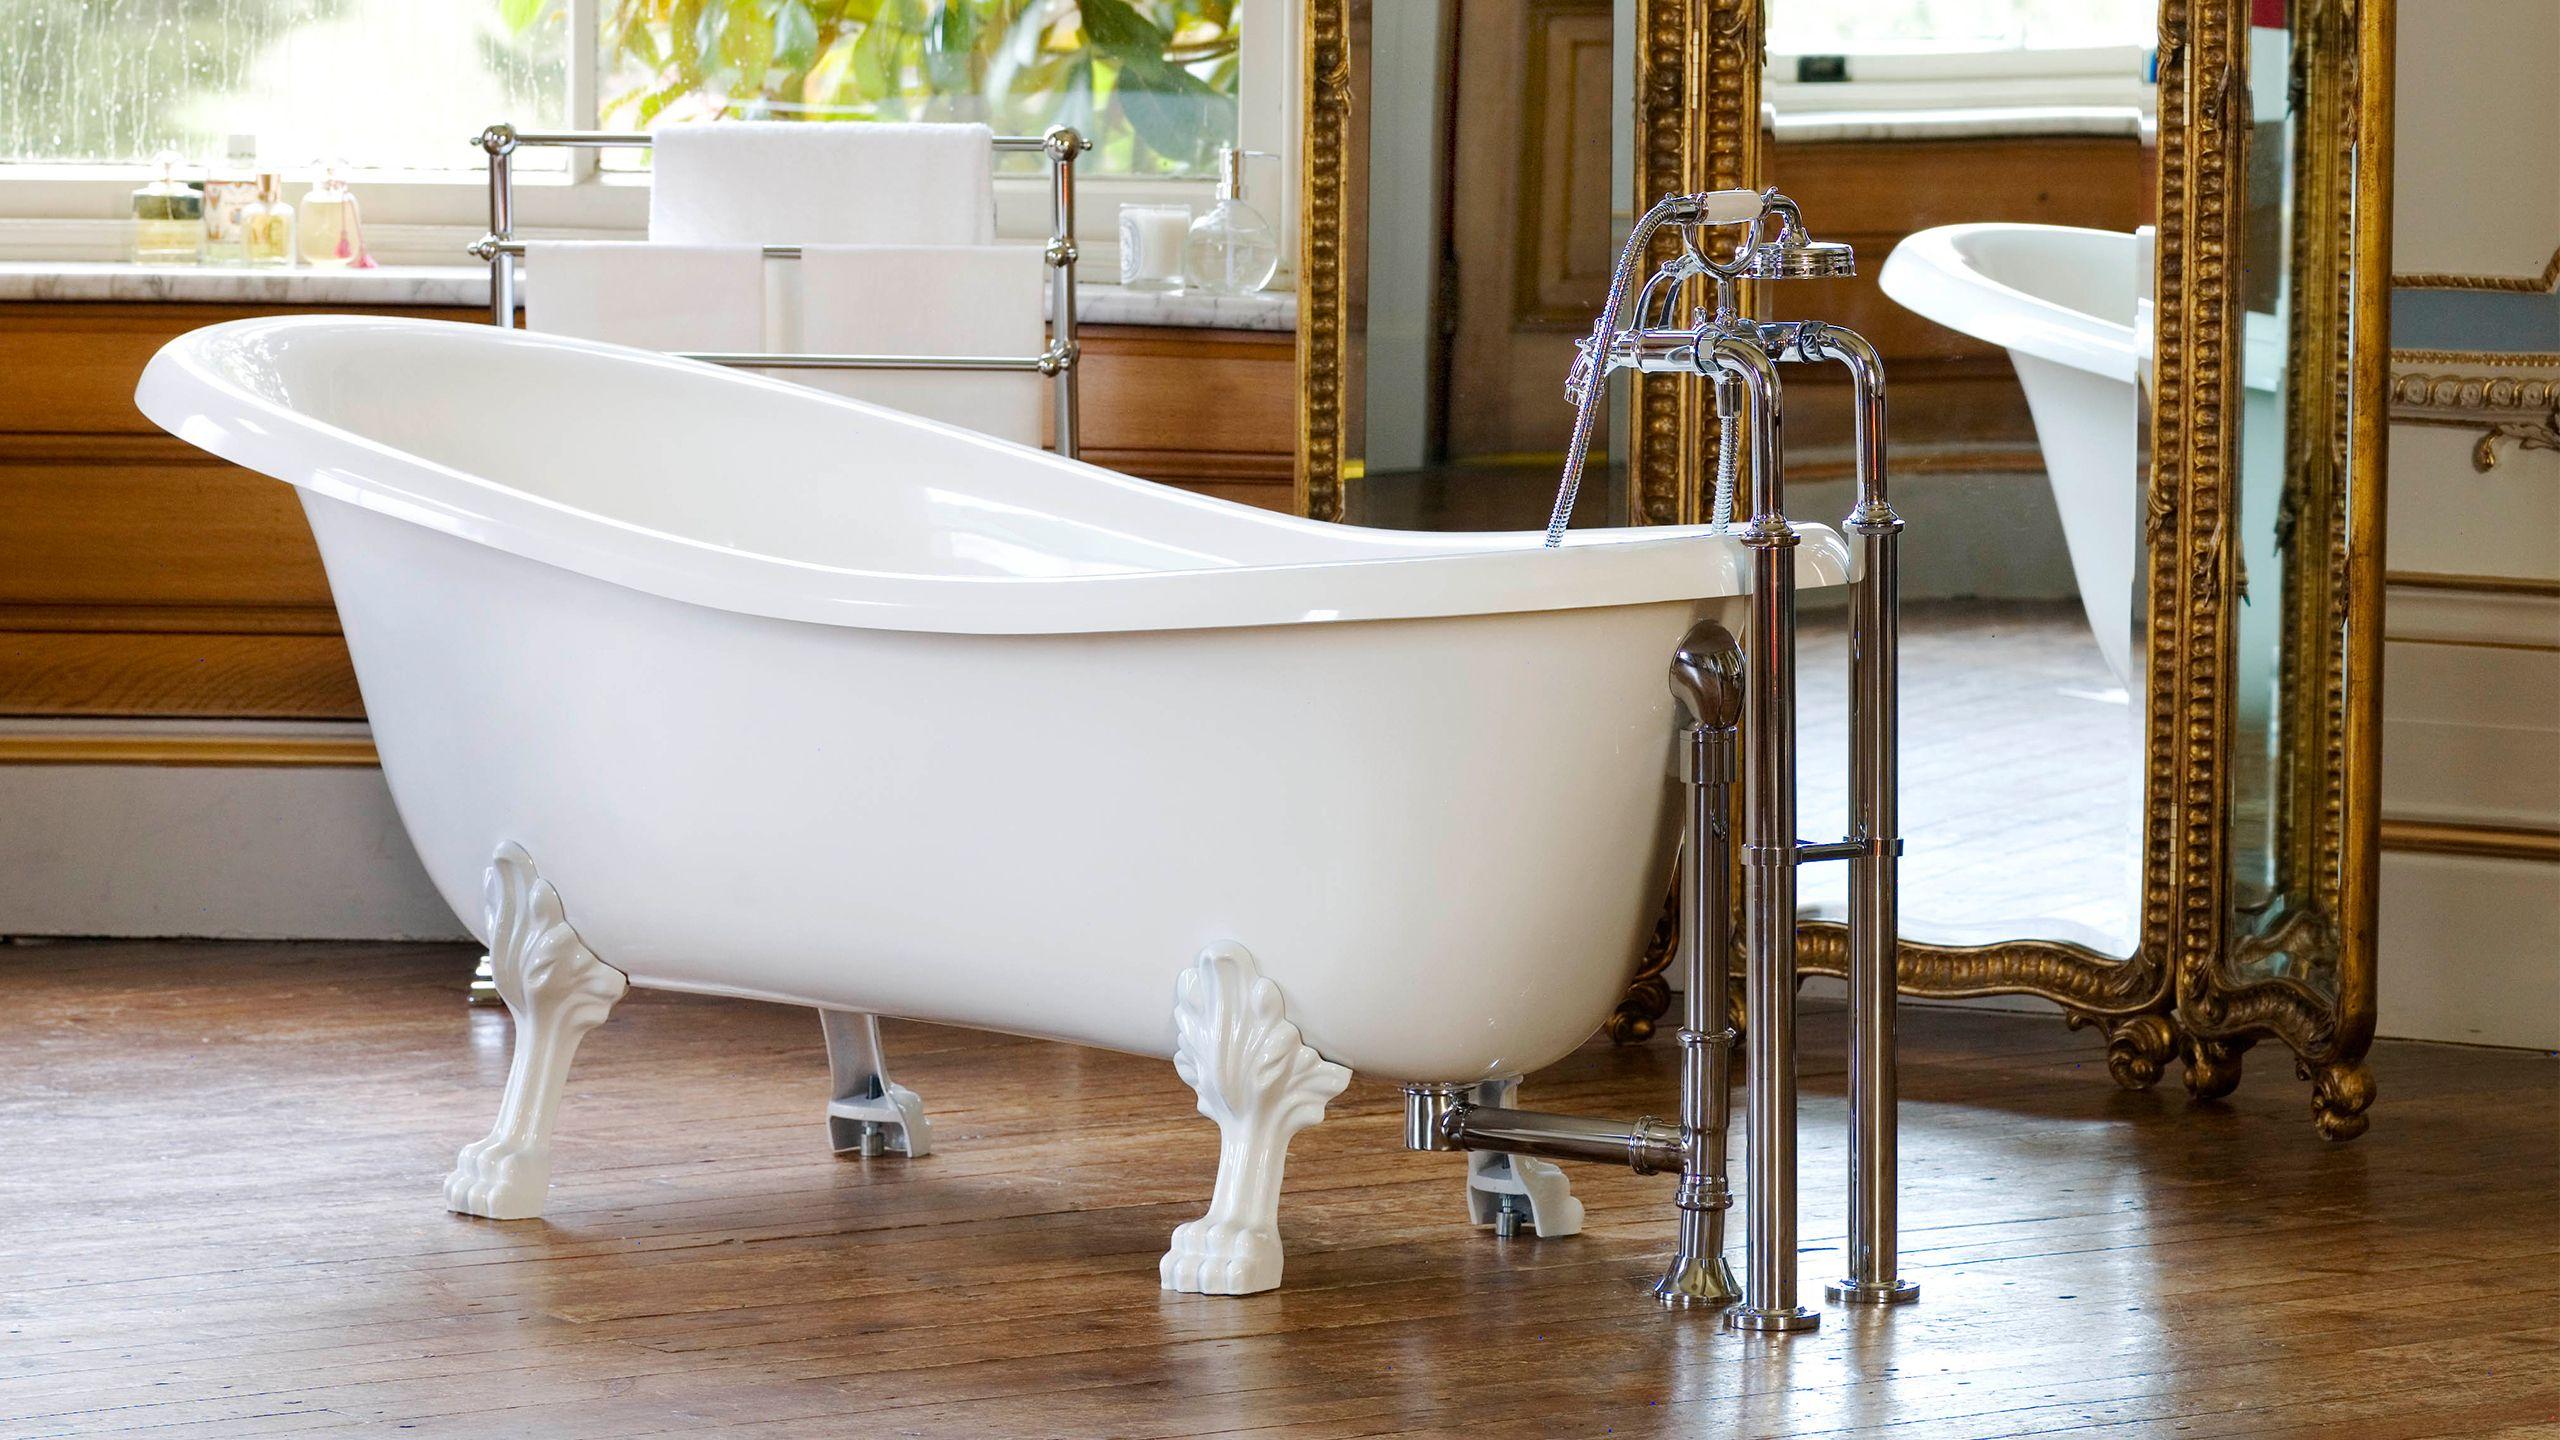 Roxburgh Freestanding Clawfoot Tub Victoria Albert Baths Usa